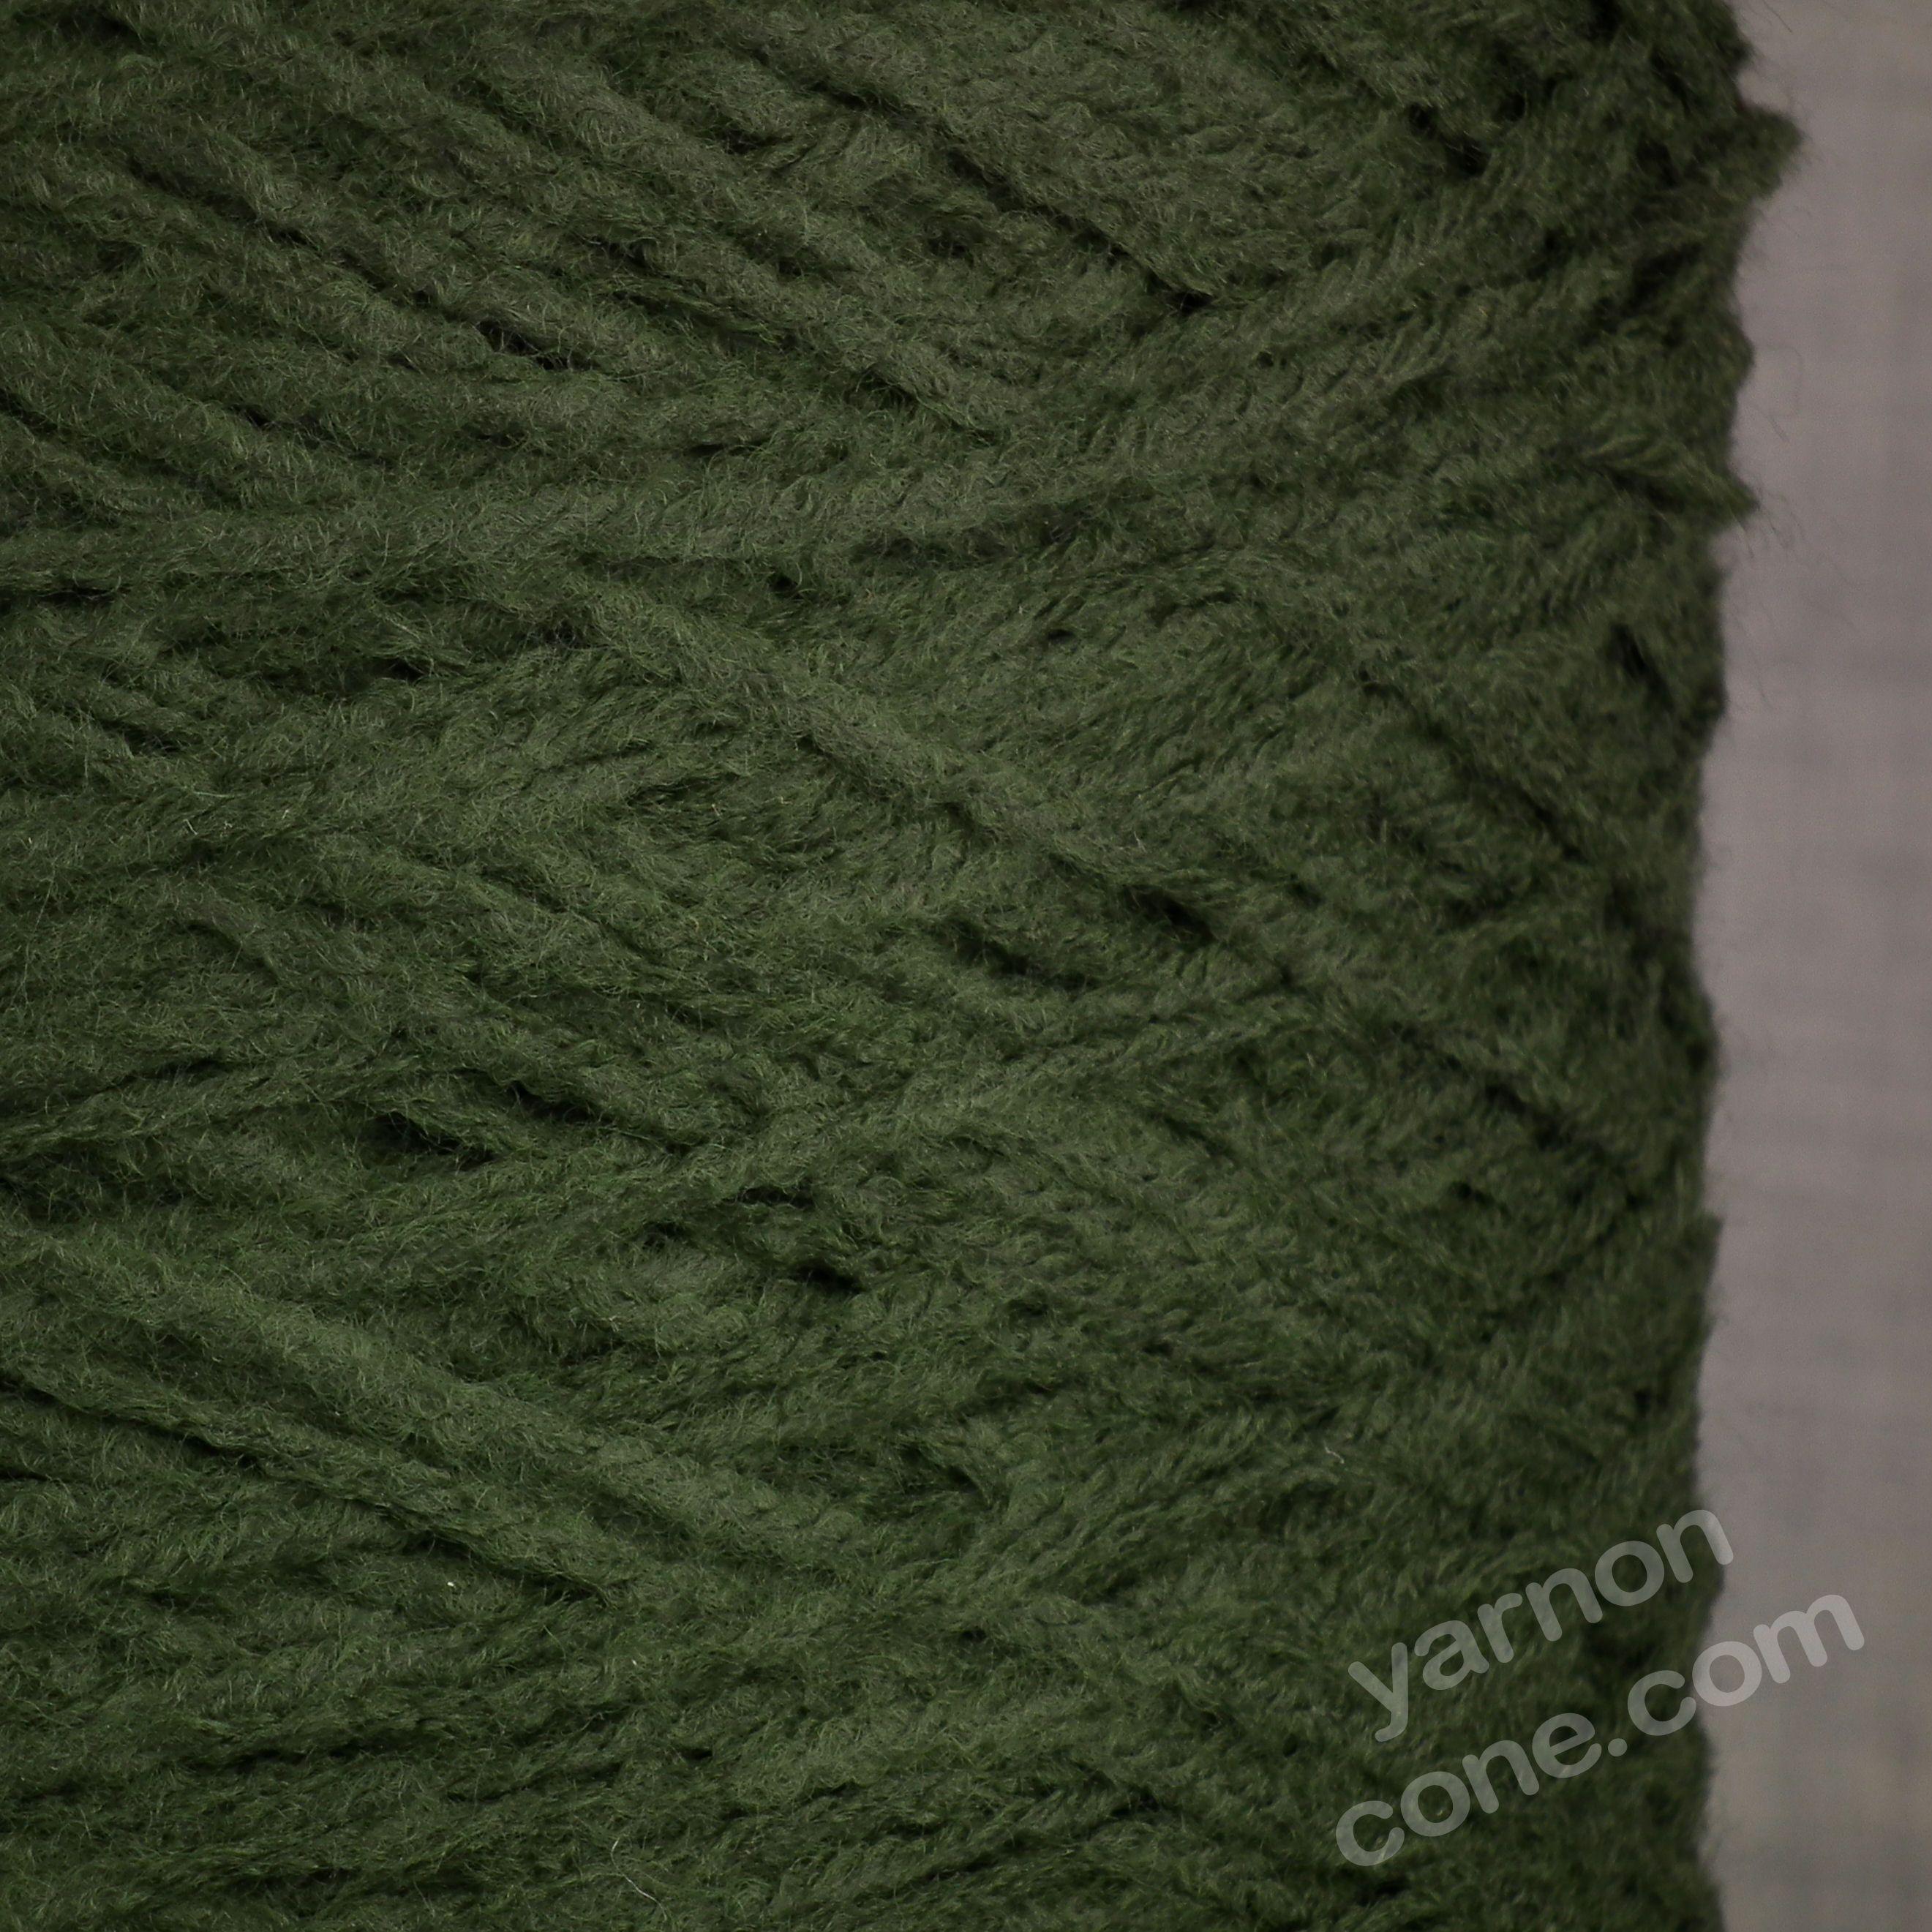 soft quality 4 ply dk double knitting wool blend knitting yarn on cone dark moss green